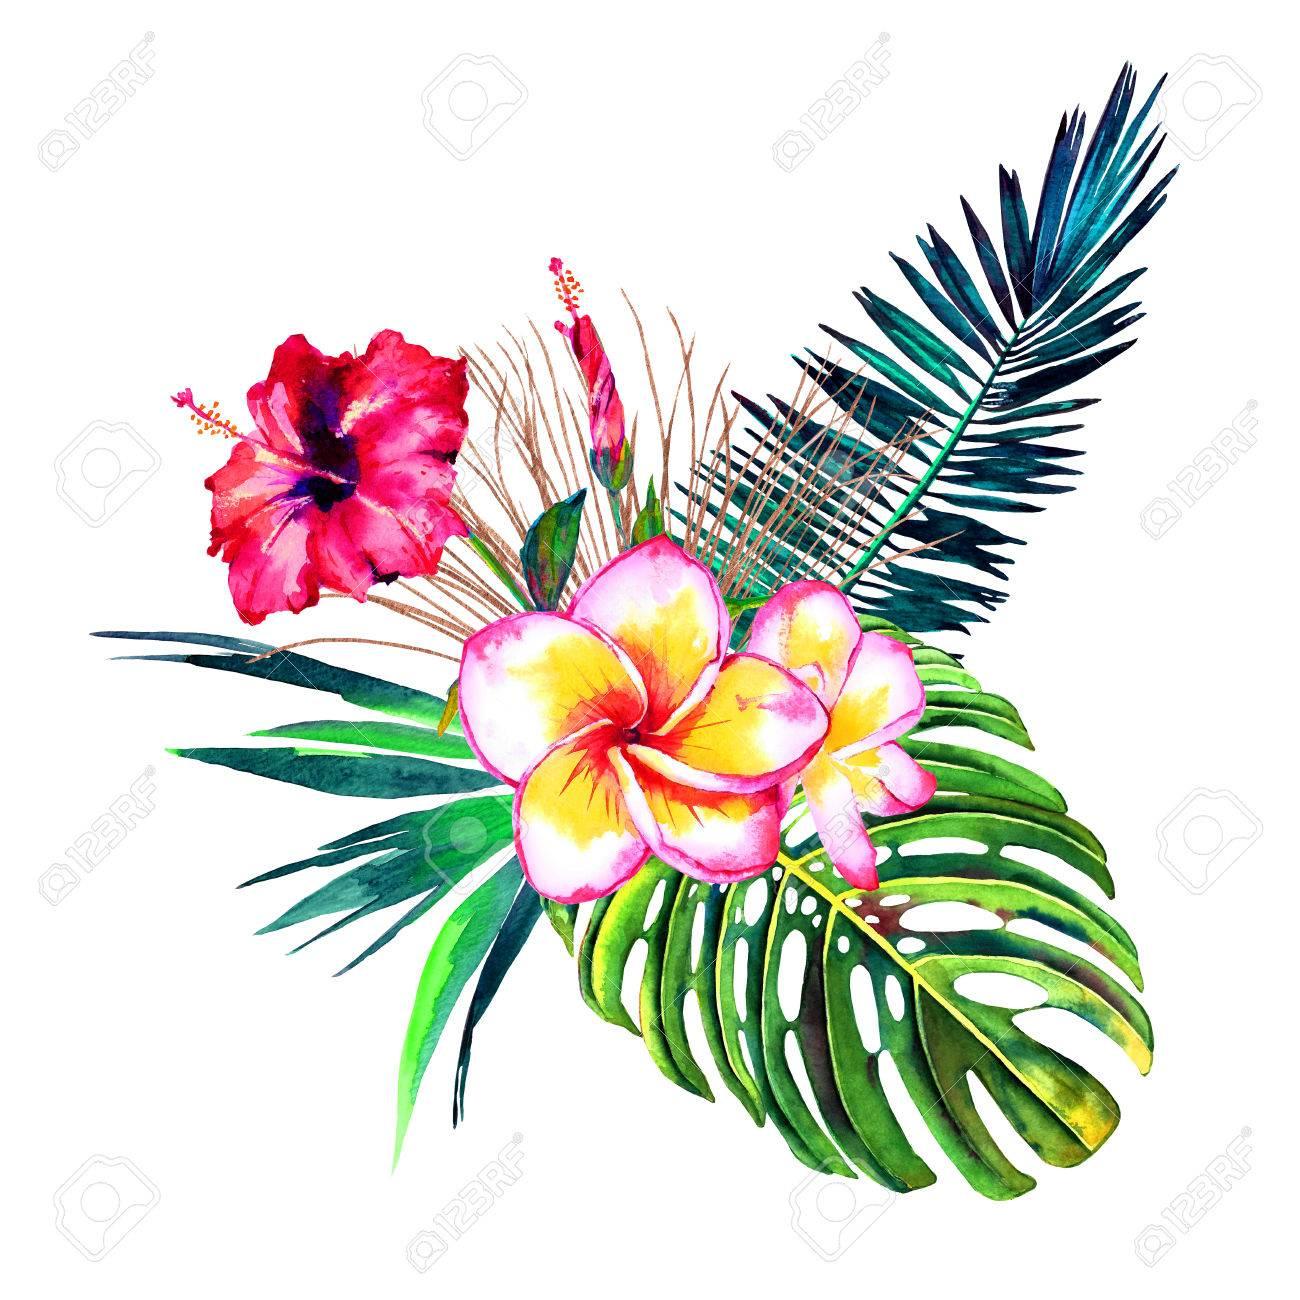 Tropical Bouquet Exotic Flowers Of Hibiscus And Plumeria Rain